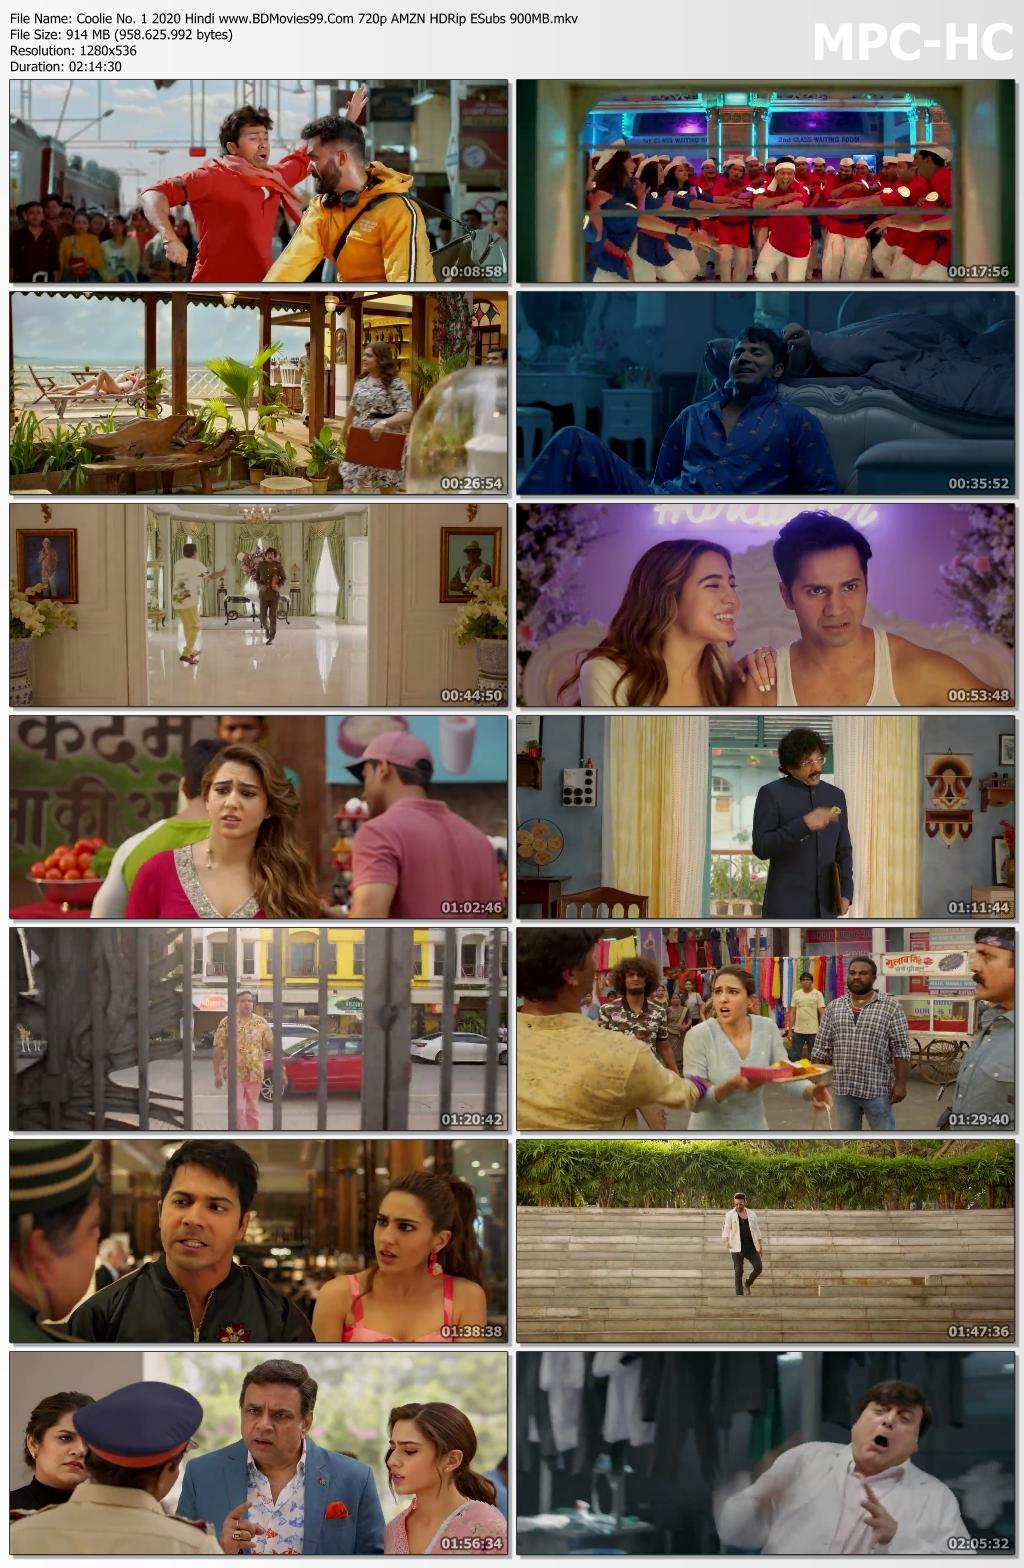 Coolie-No-1-2020-Hindi-www-BDMovies99-Com-720p-AMZN-HDRip-ESubs-900-MB-mkv-thumbs